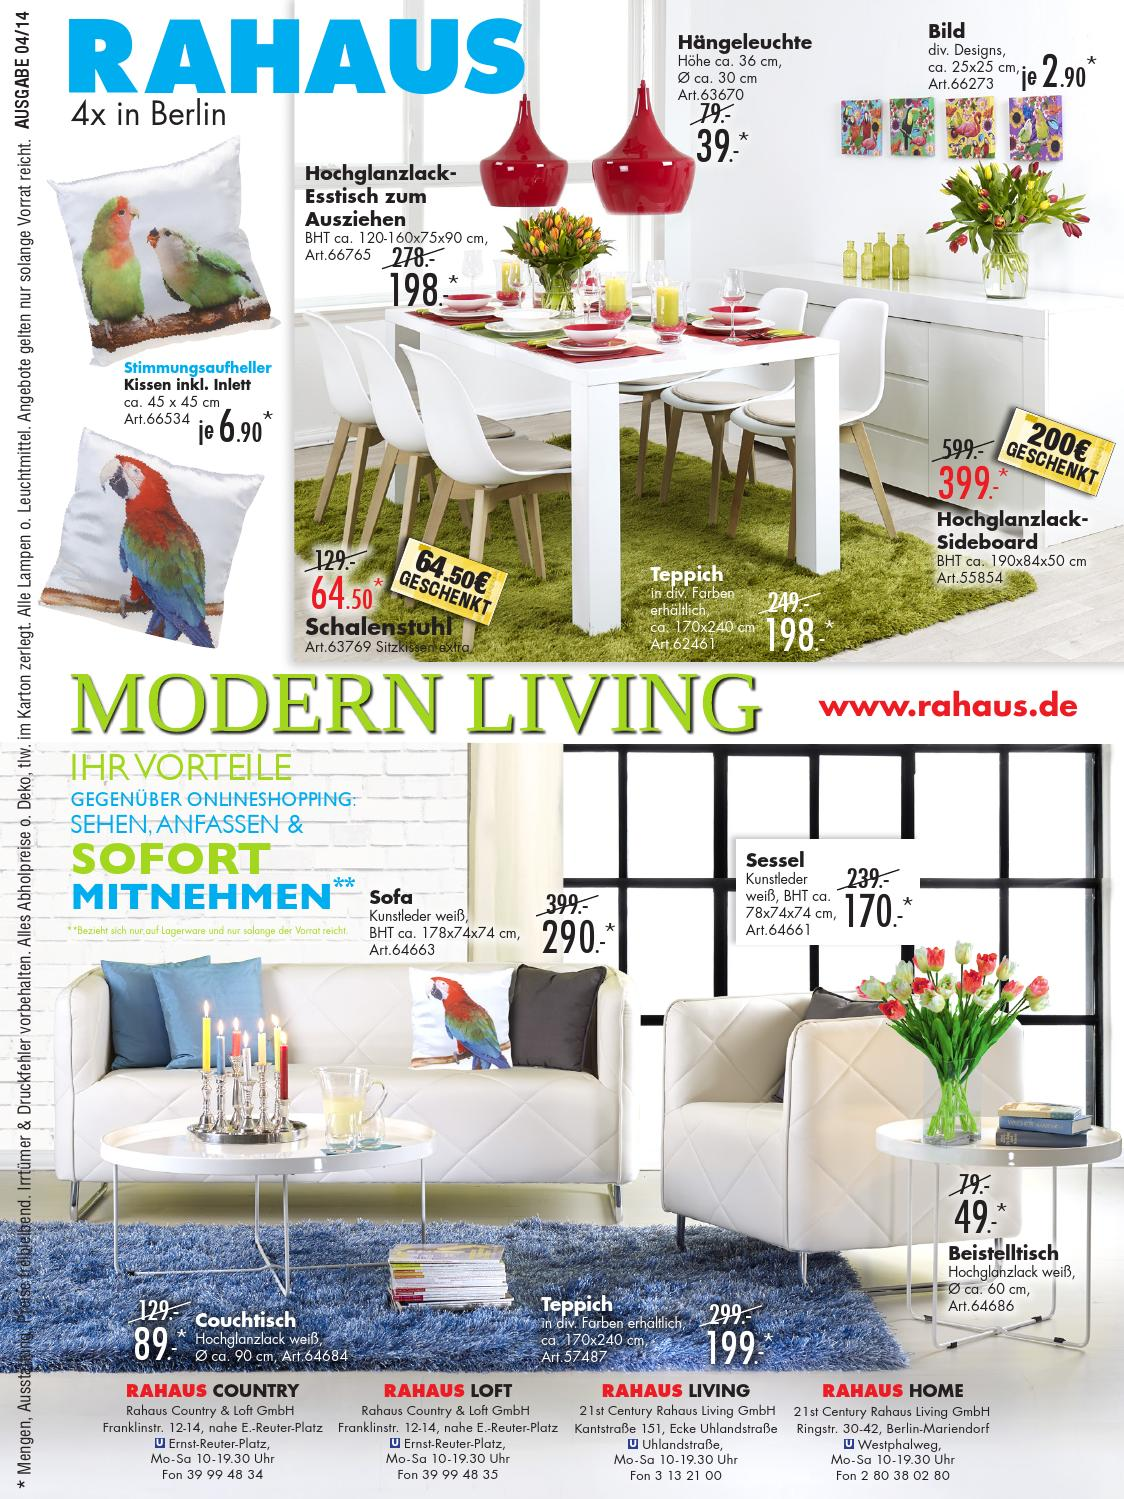 Möbel rahaus prospekt 2014 04 10 by catalogofree - issuu